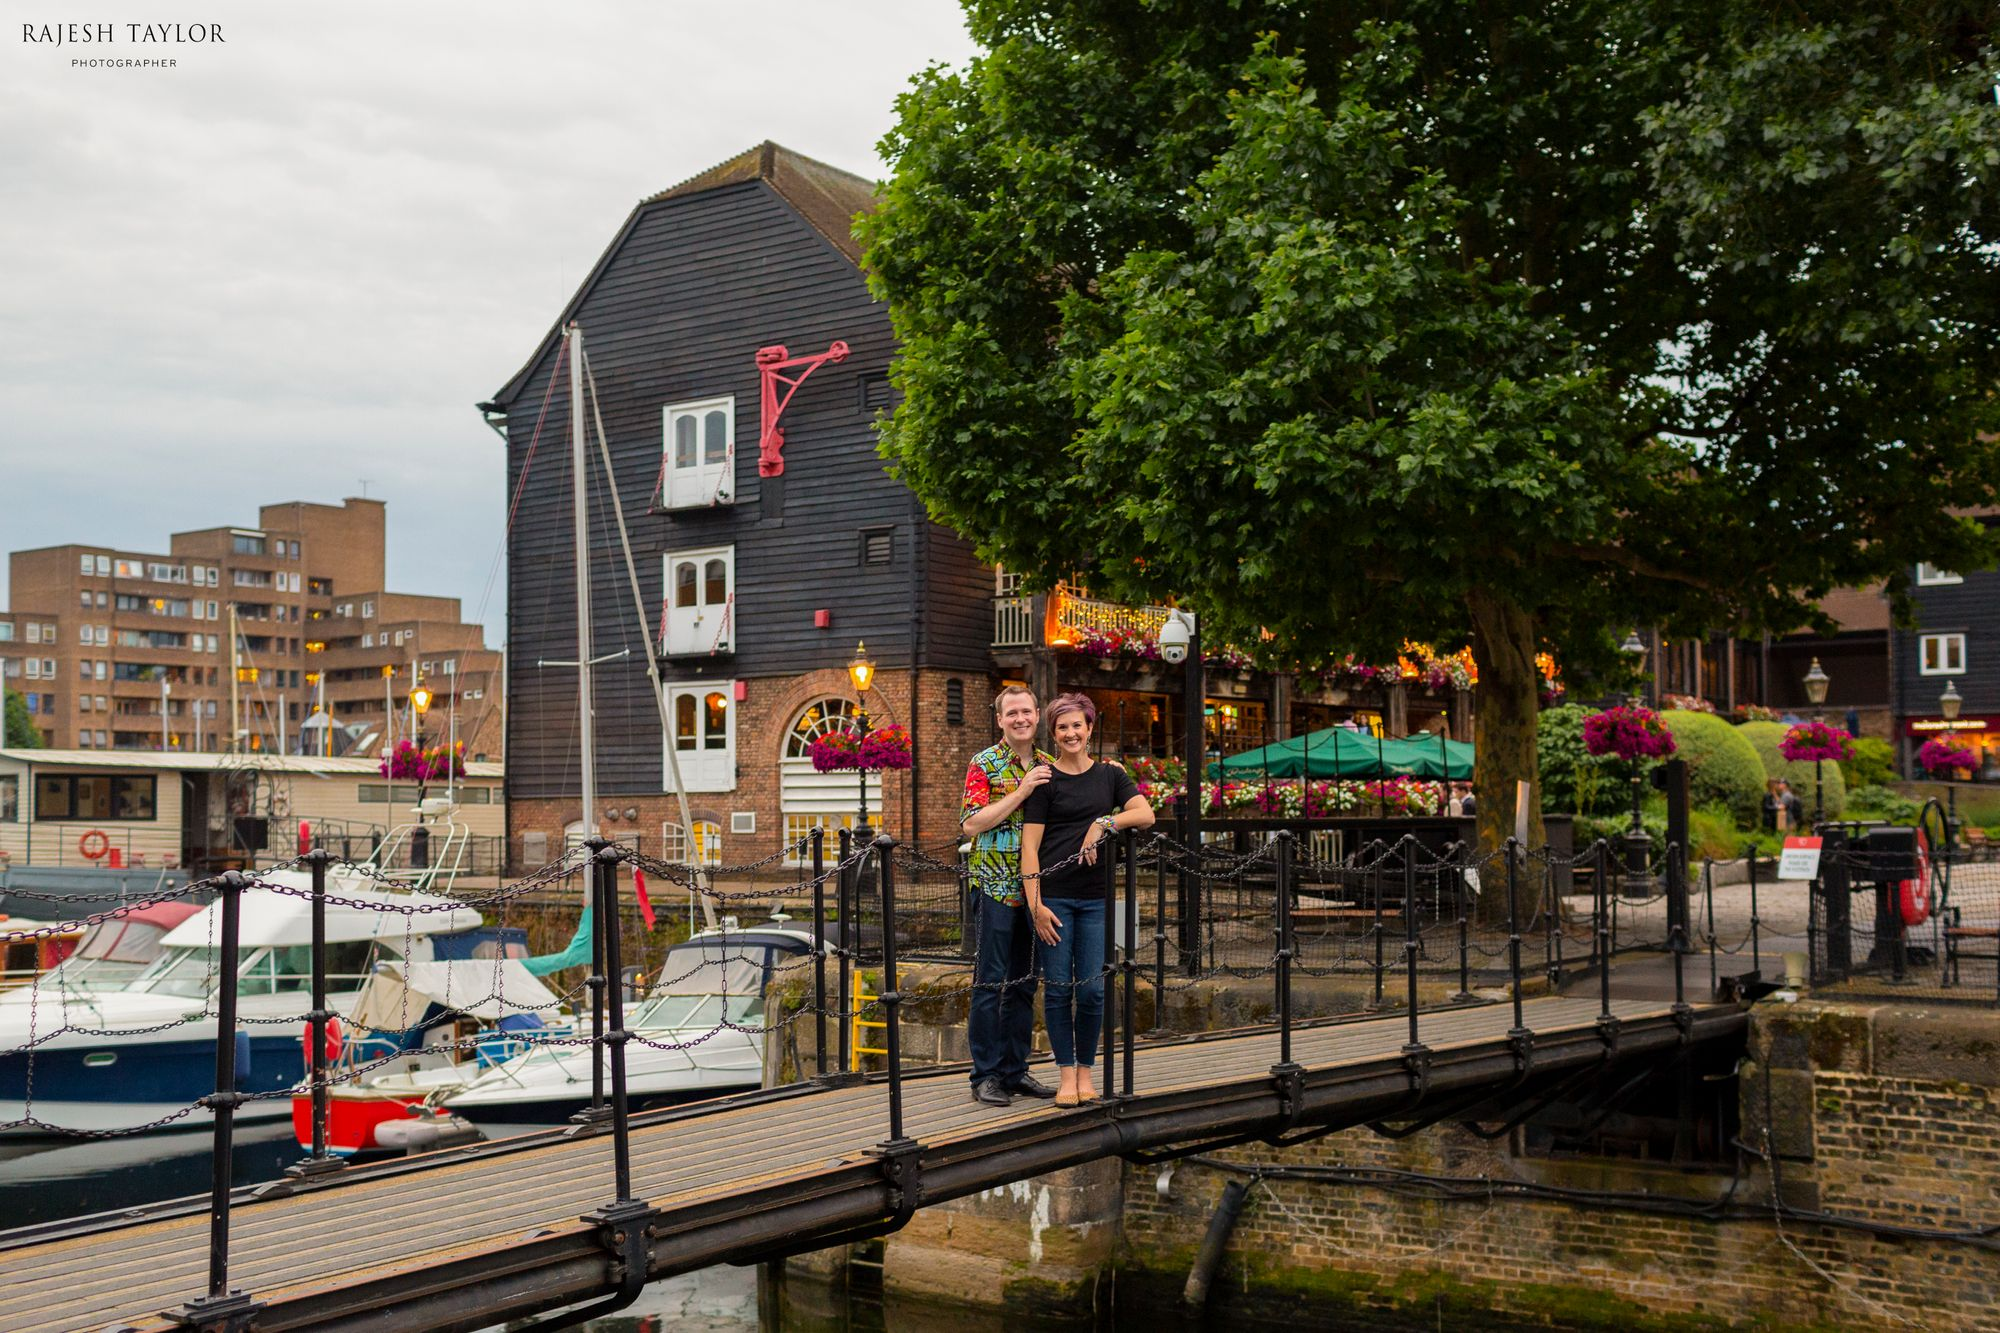 Telford's Lock and Footbridge, St Katherine's dock © Rajesh Taylor